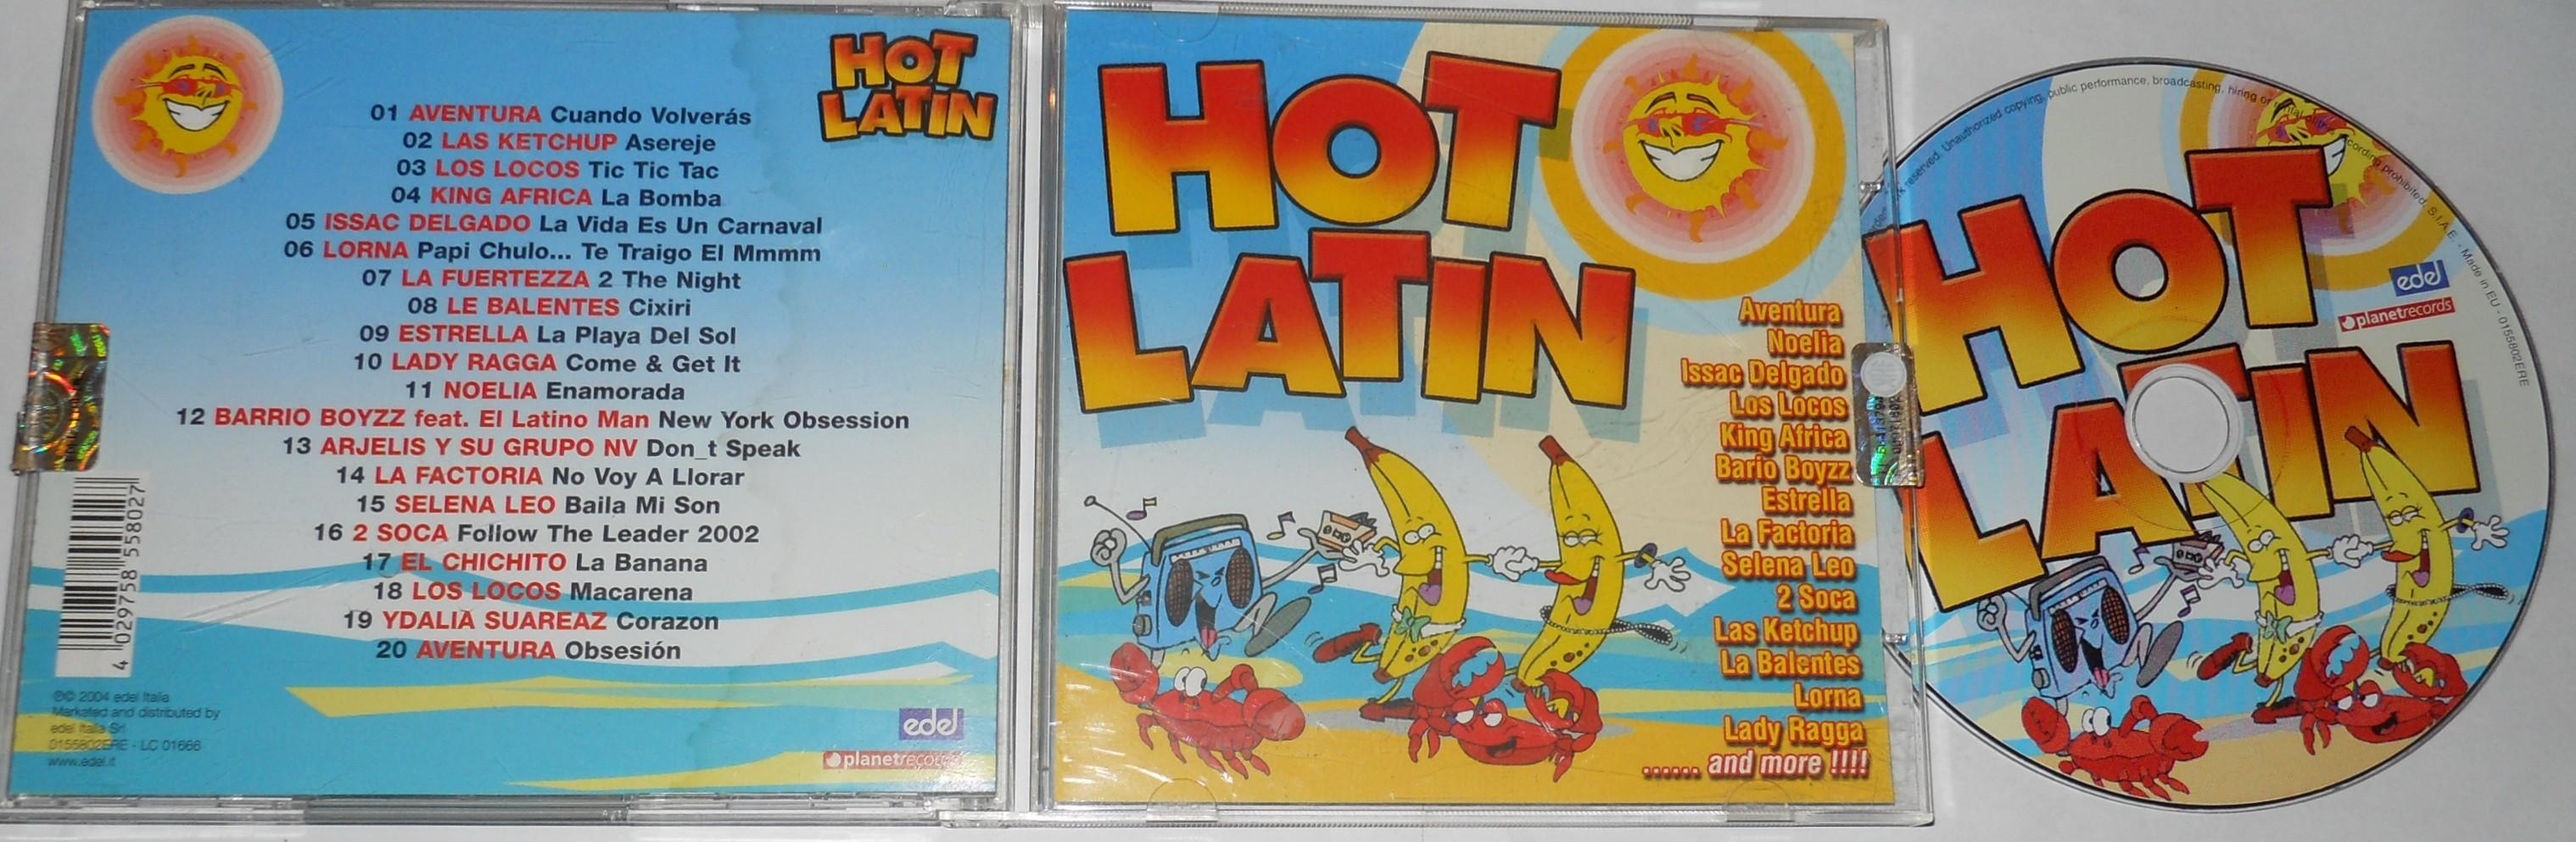 hot latin